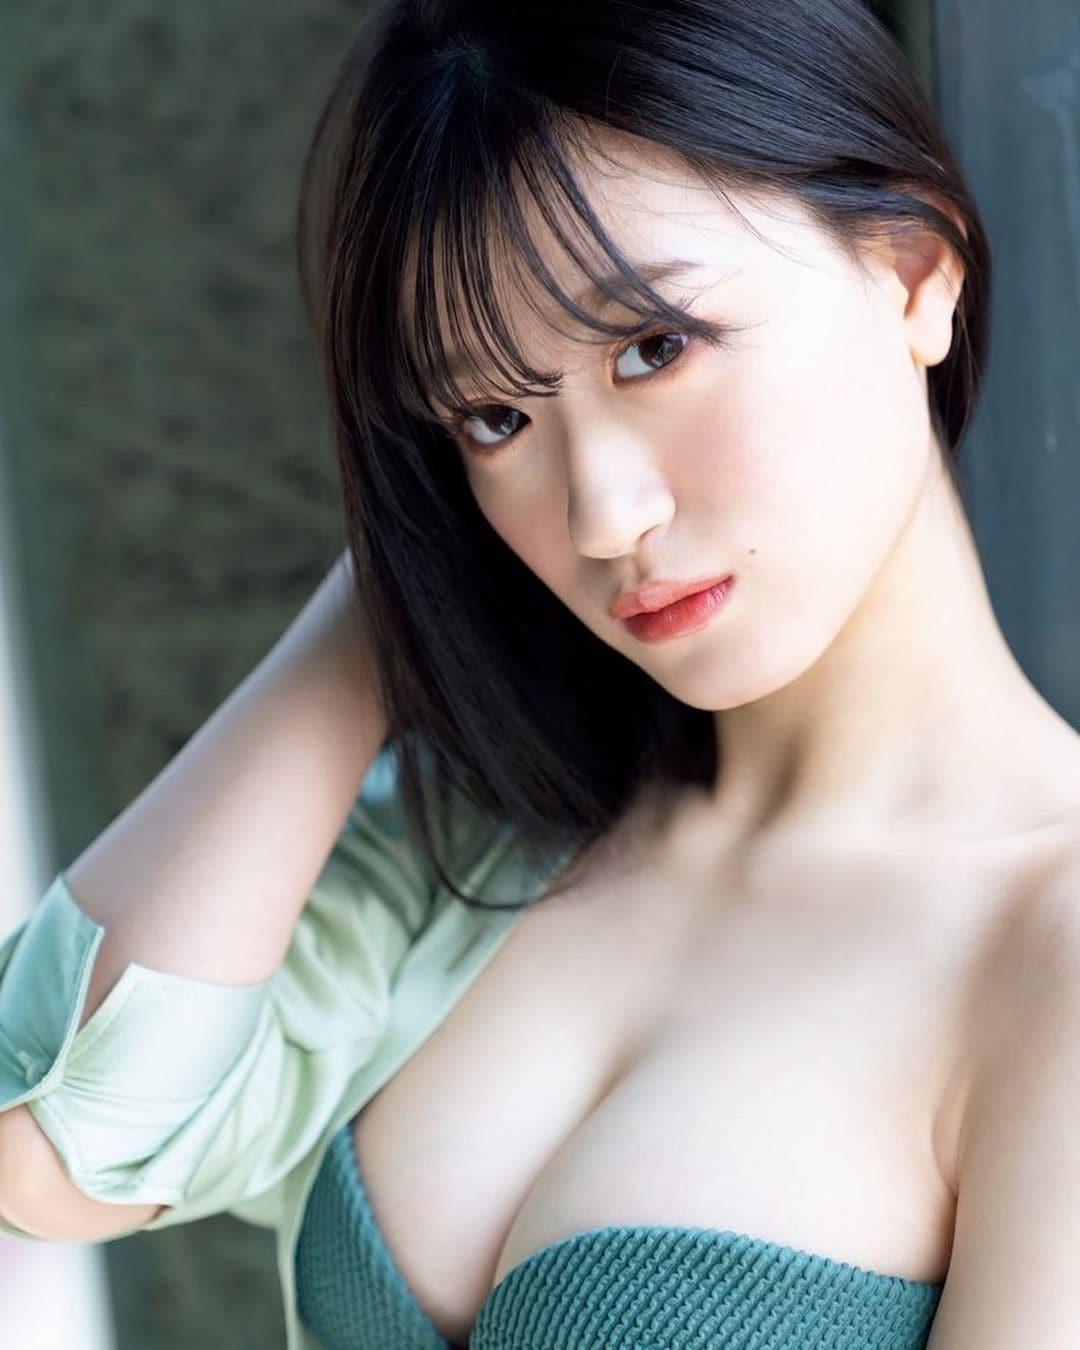 NMB48上西怜「バニーガール初体験!」オトナなグラビアでファン魅了【画像2枚】の画像001